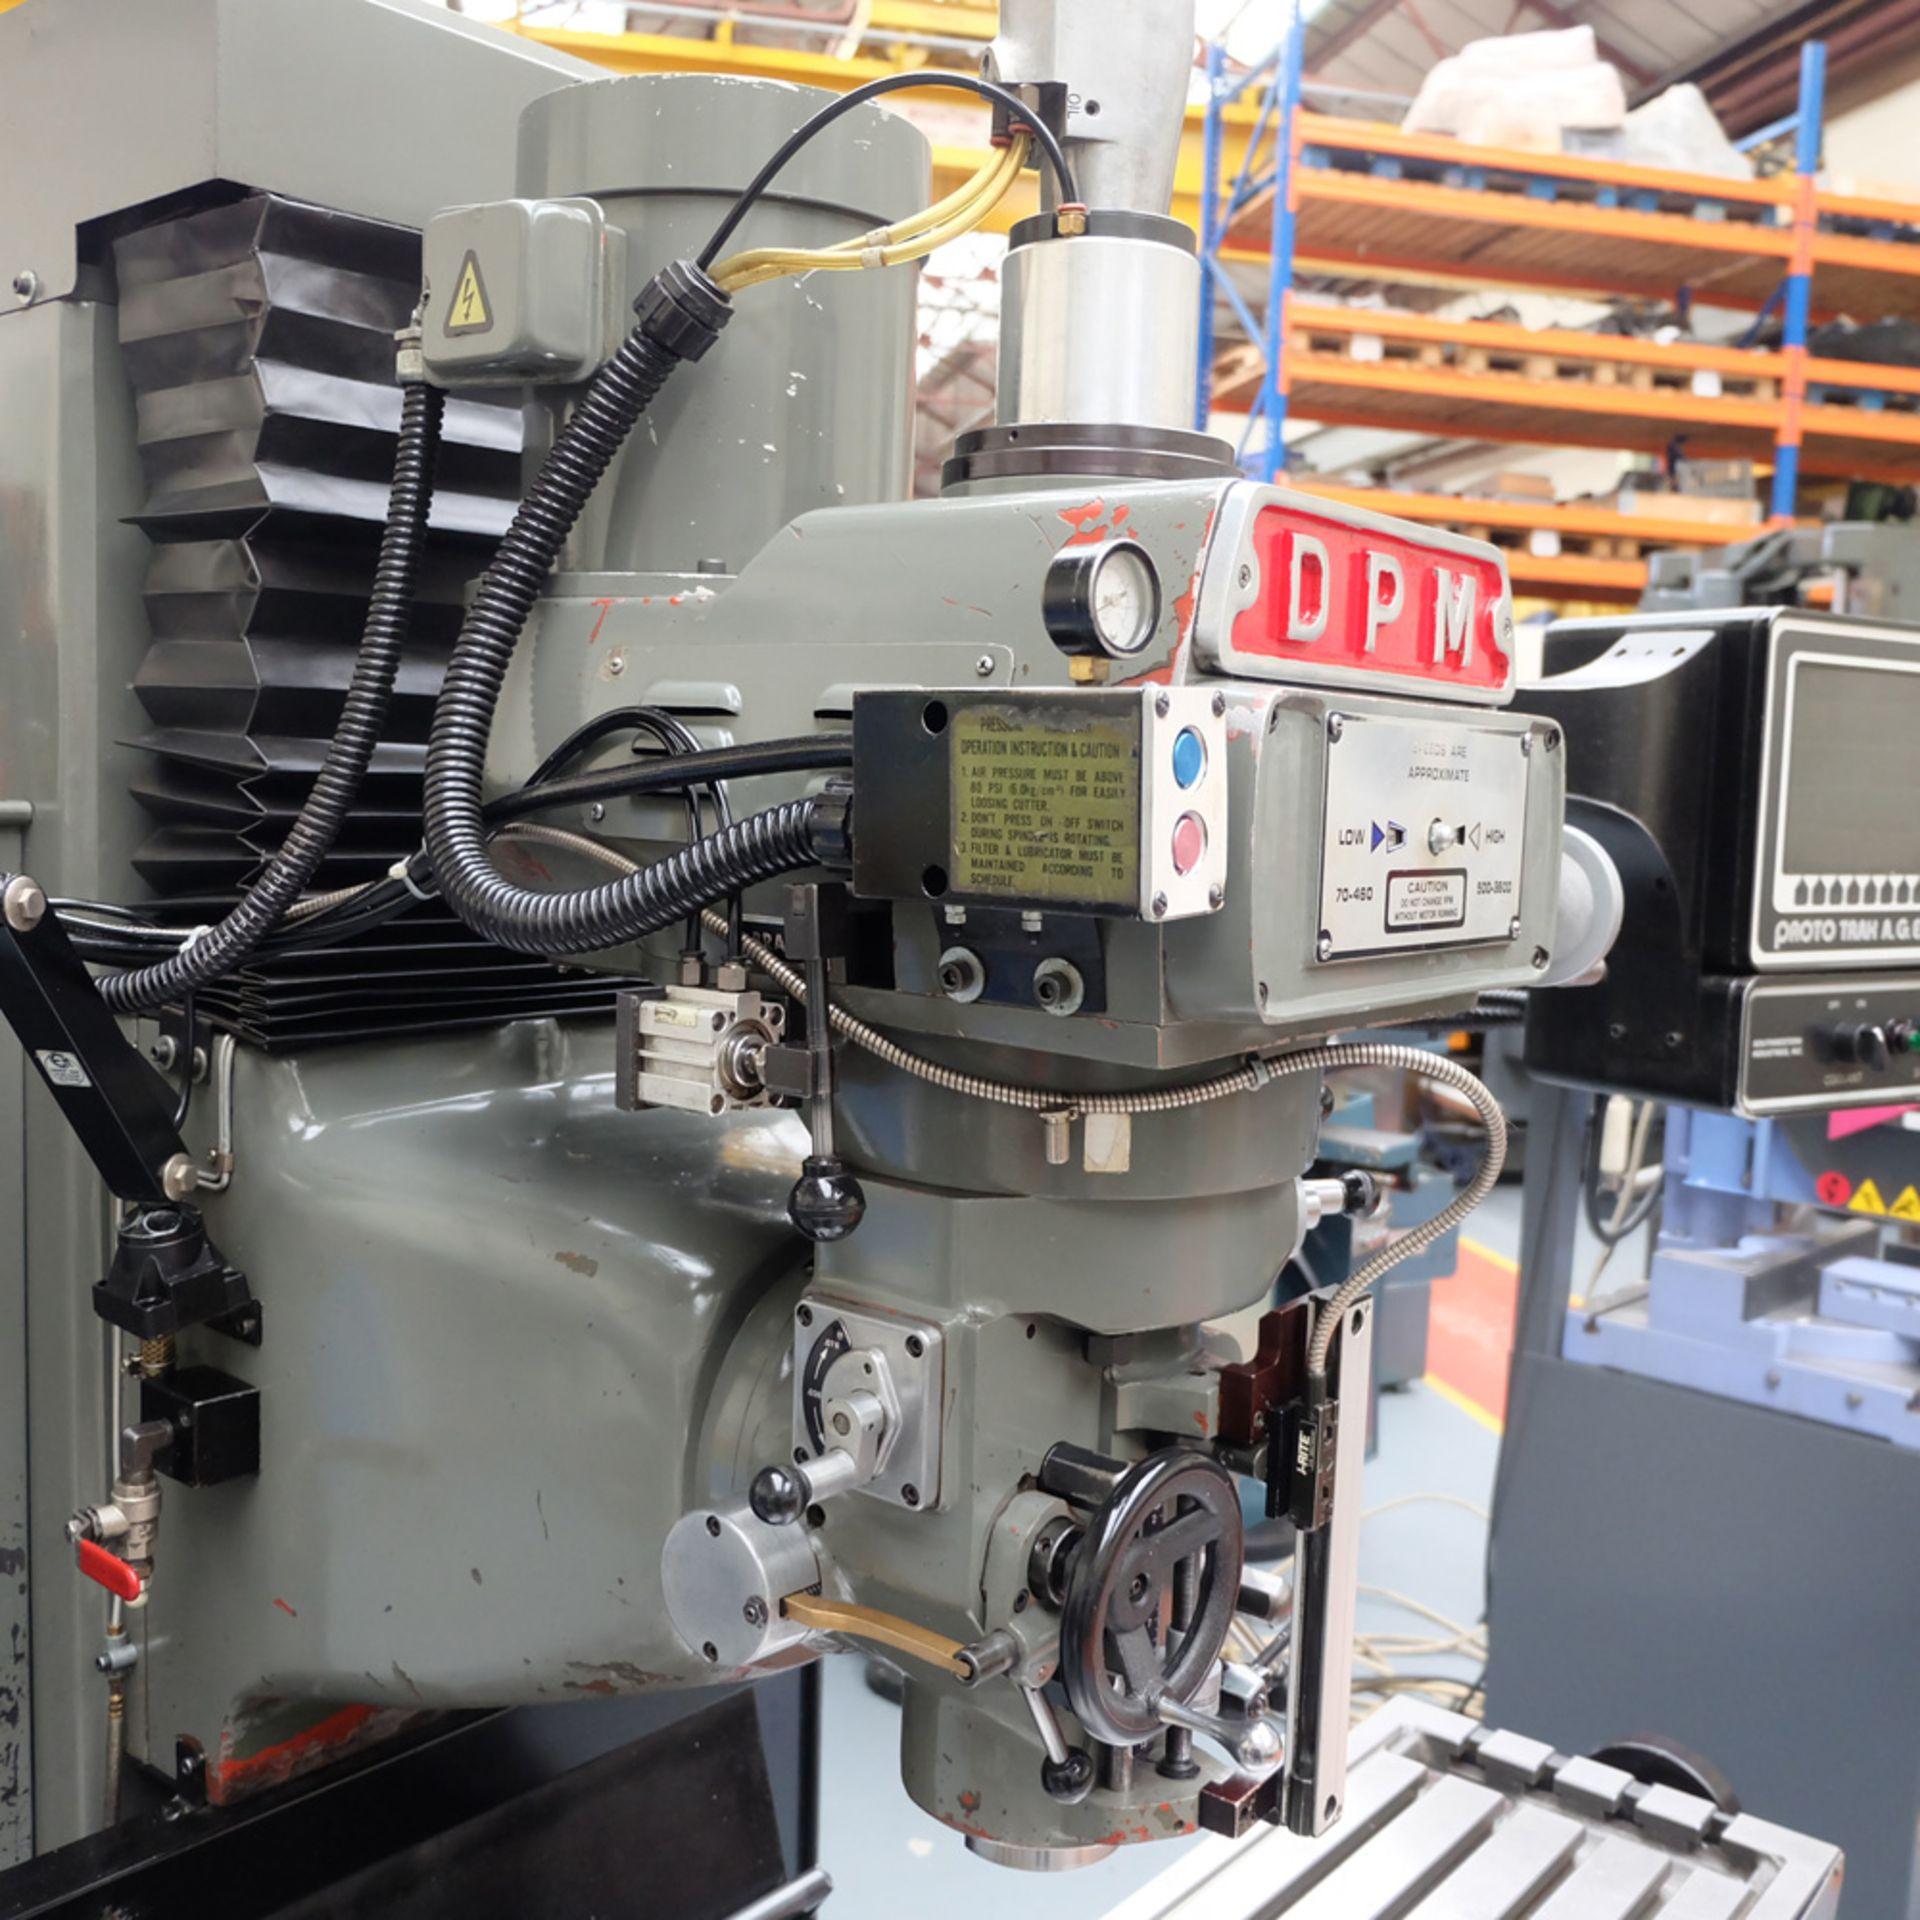 XYZ DPM Bed Mill with ProtoTRAK A.G.E. 3 Control. Prototrak A.G.E. - Image 5 of 10